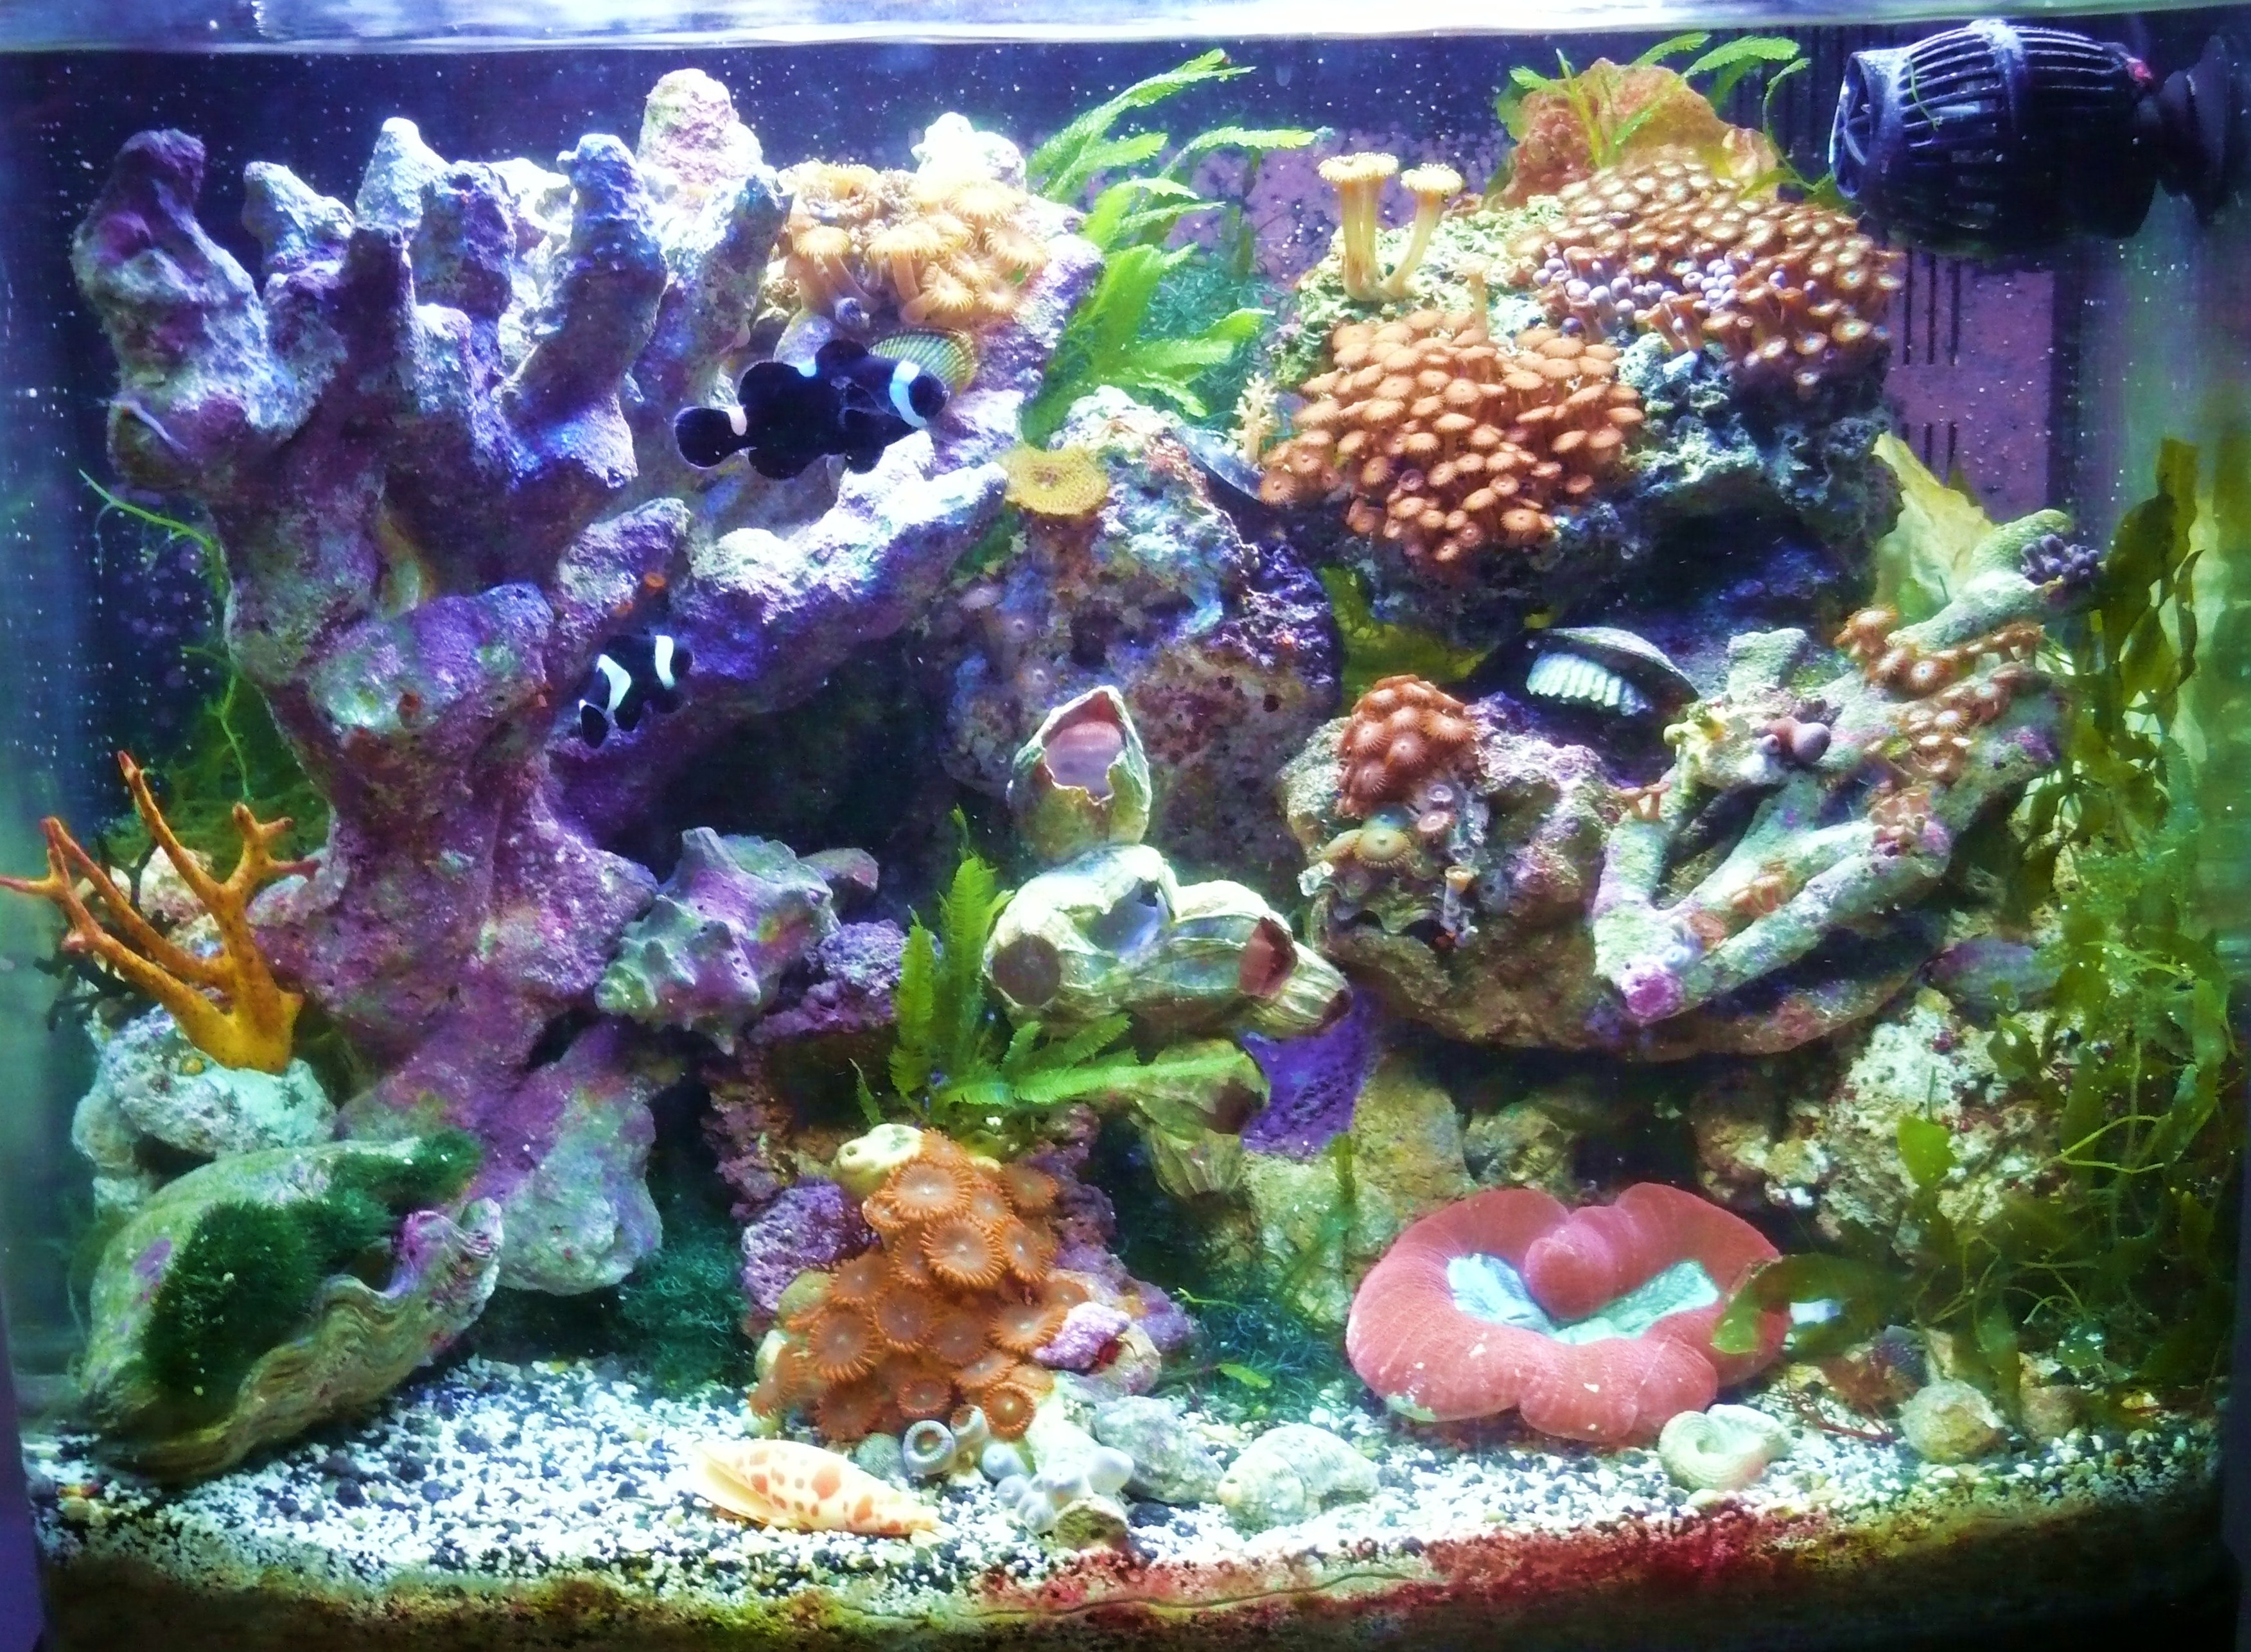 Frag nursery for coral propagation.